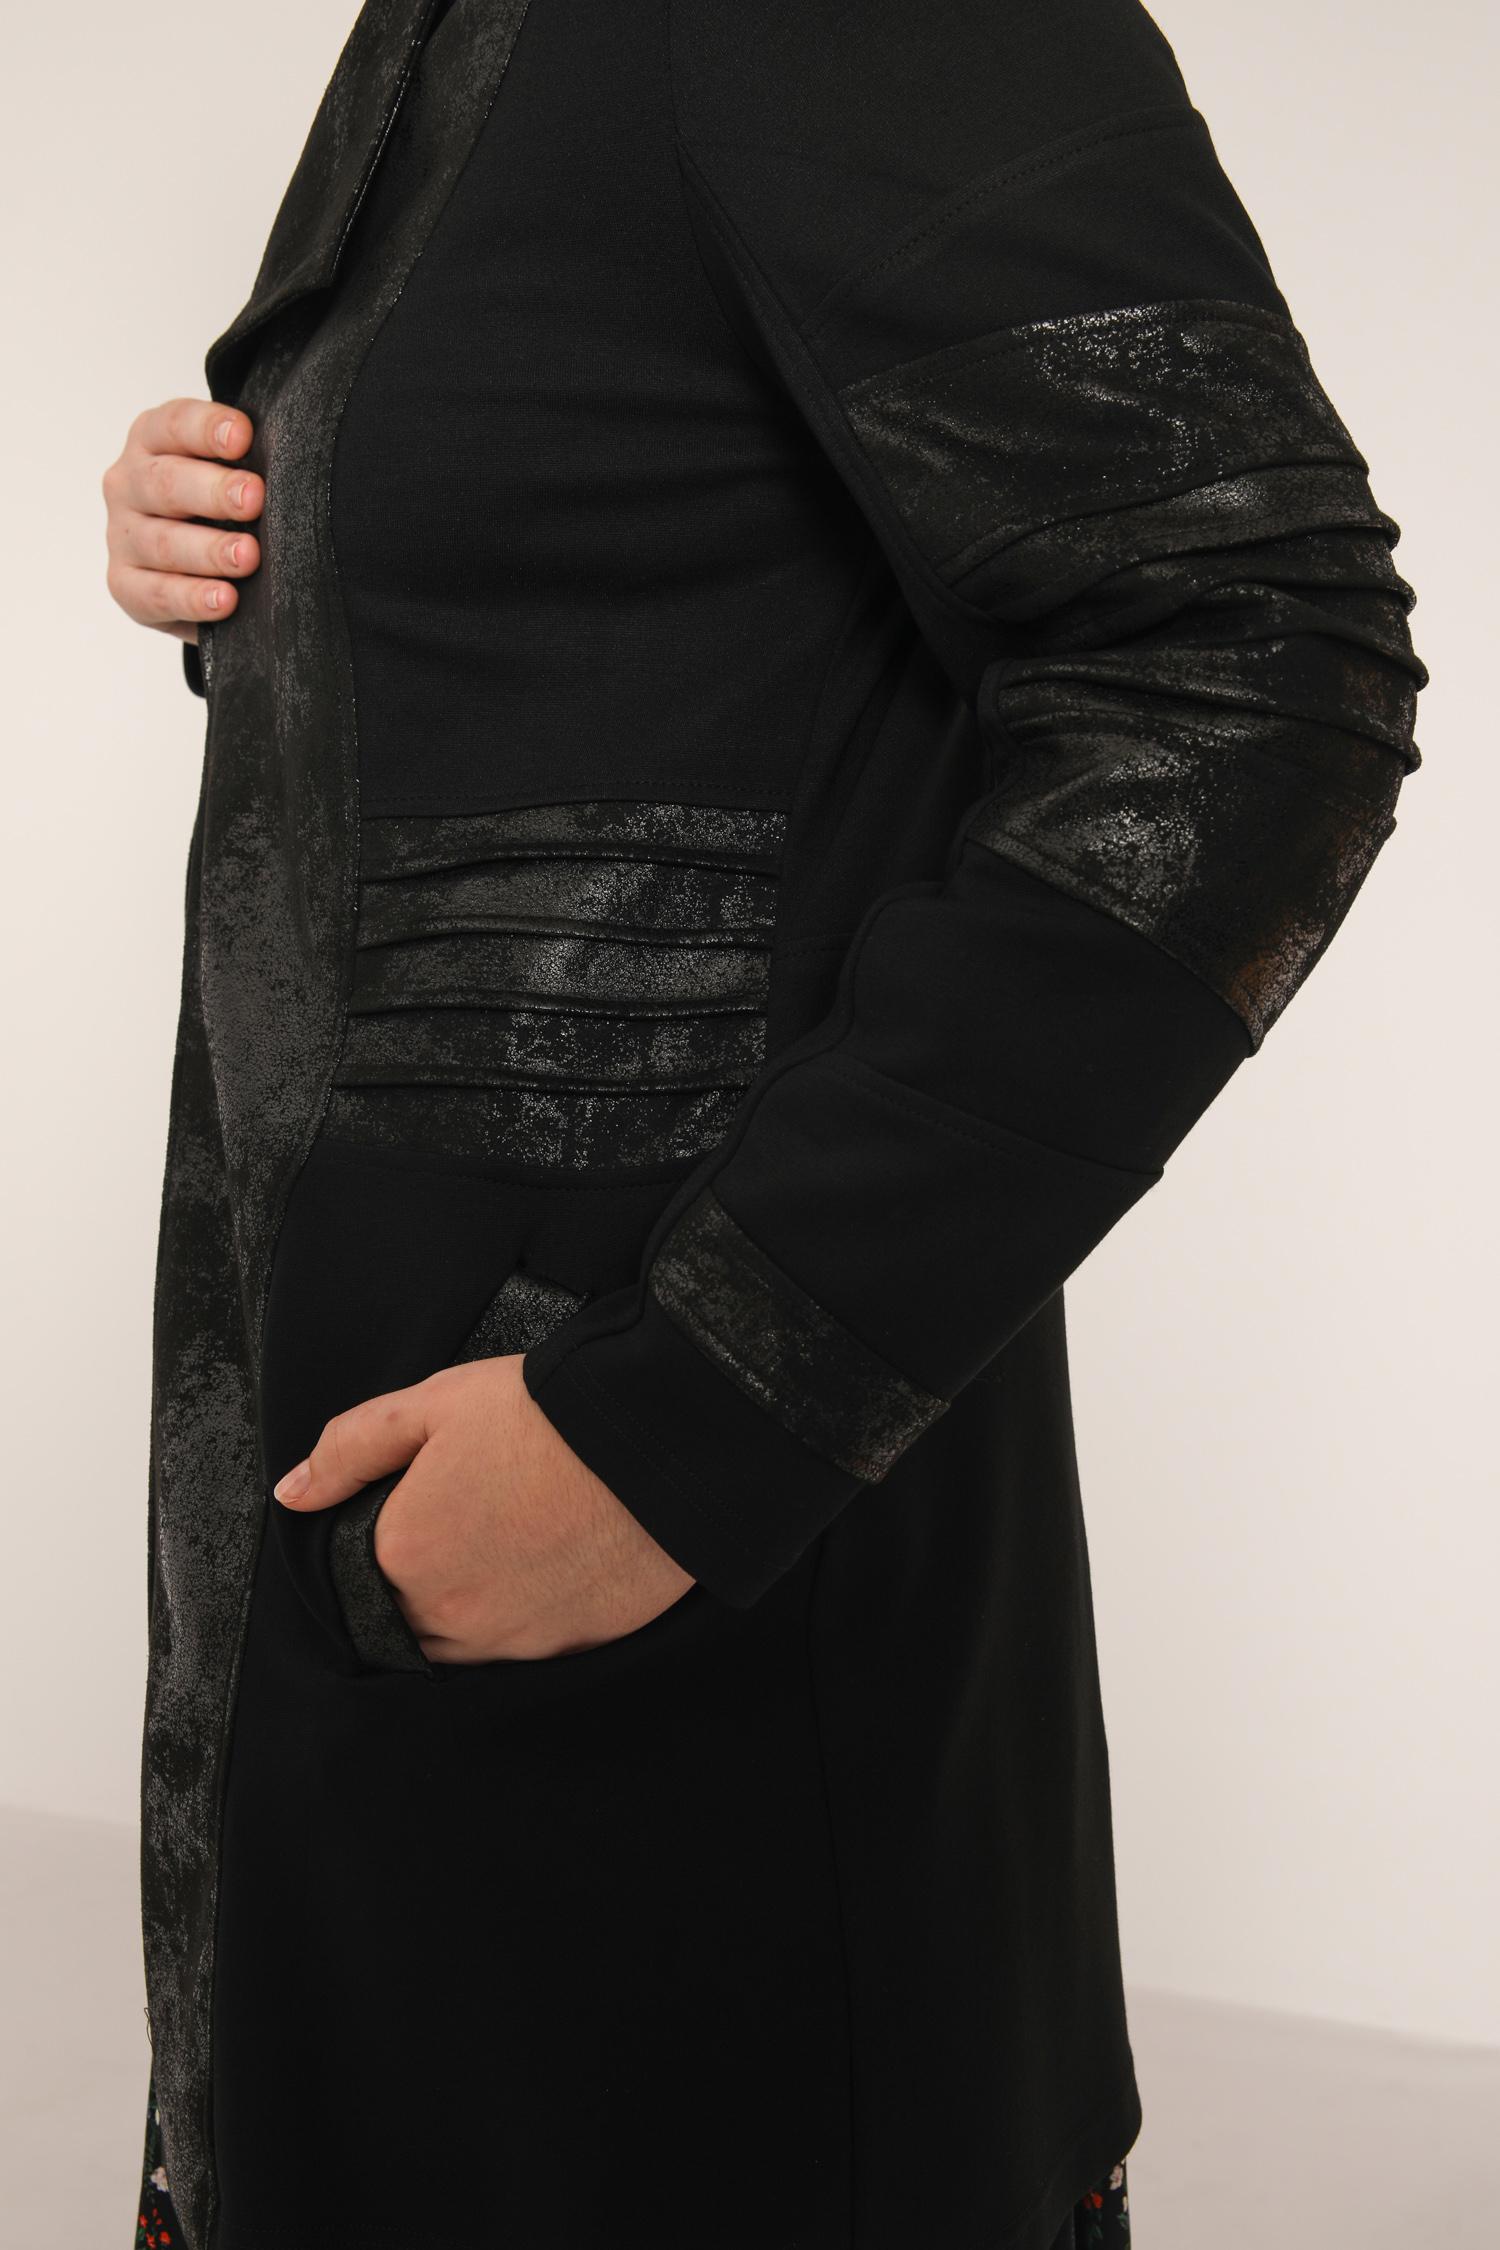 Bi-material Milan jacket and vegan leather